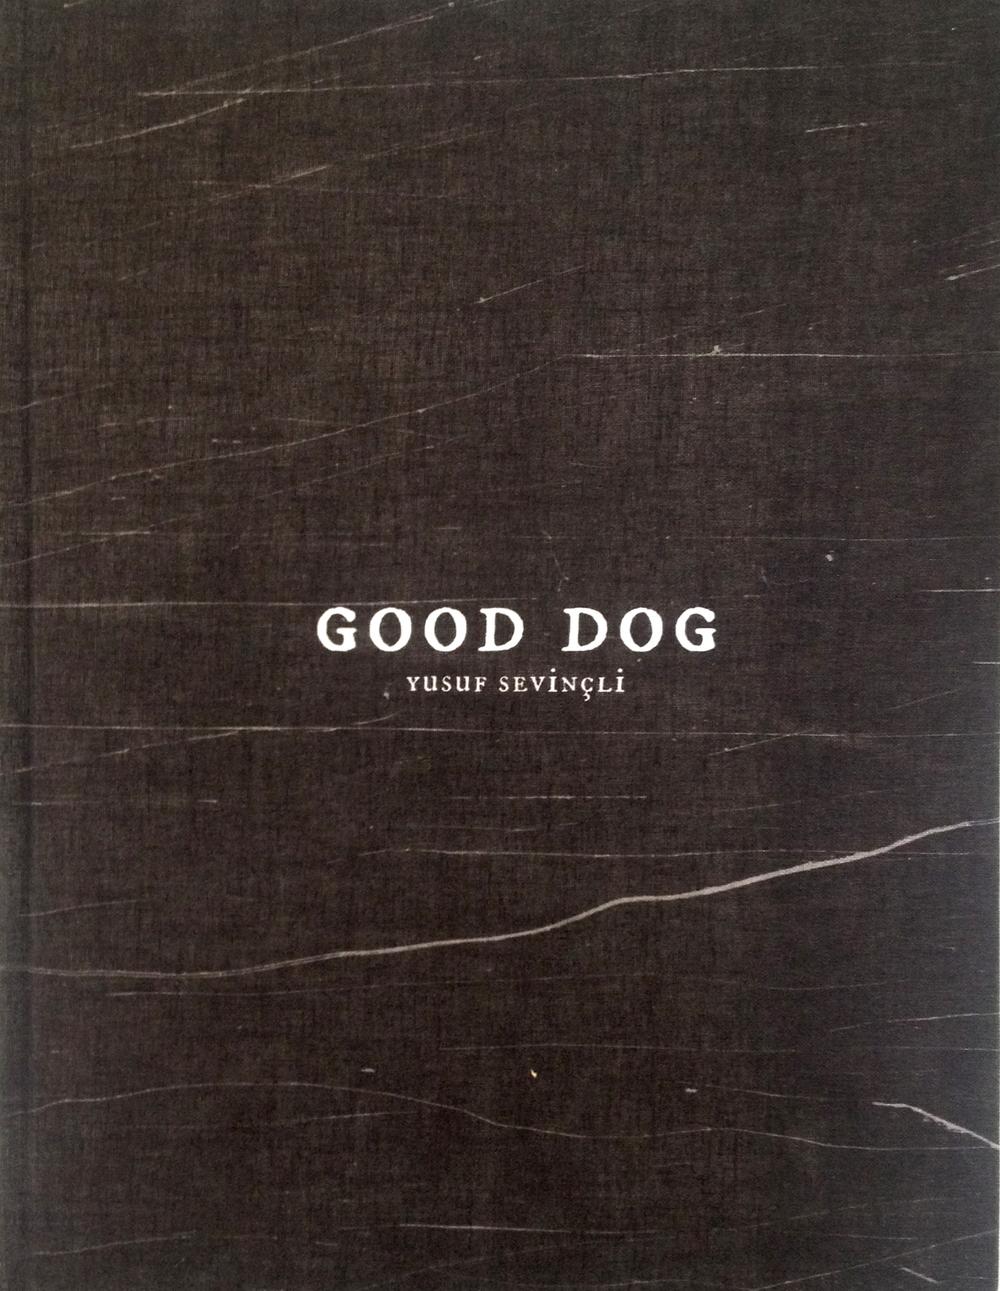 Yusuf Sevinçli  - Good Dog